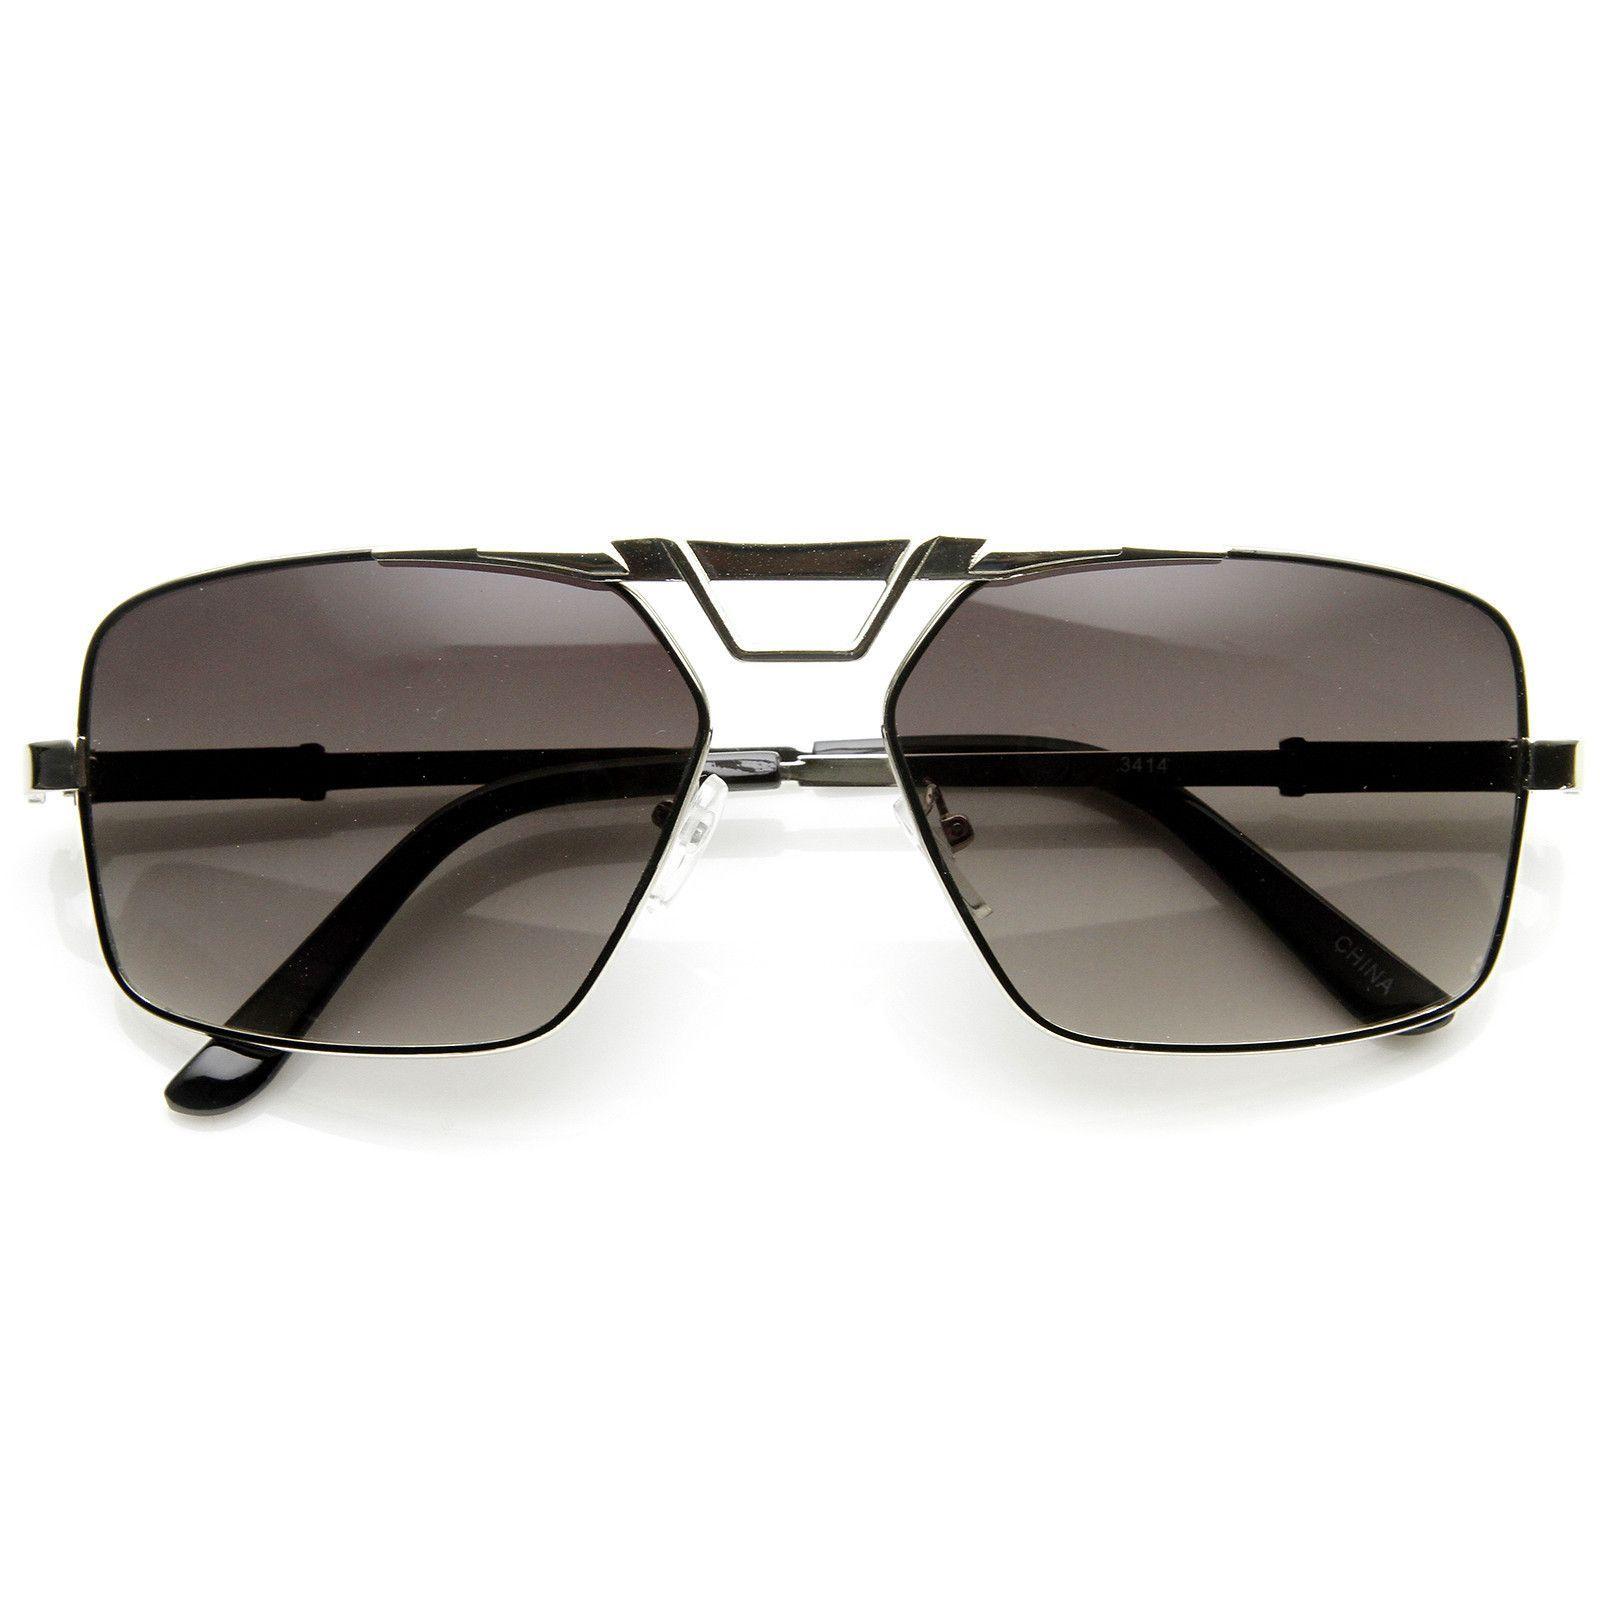 Modern Mens GQ Fashion Large Square Metal Frame Aviator Sunglasses 8988